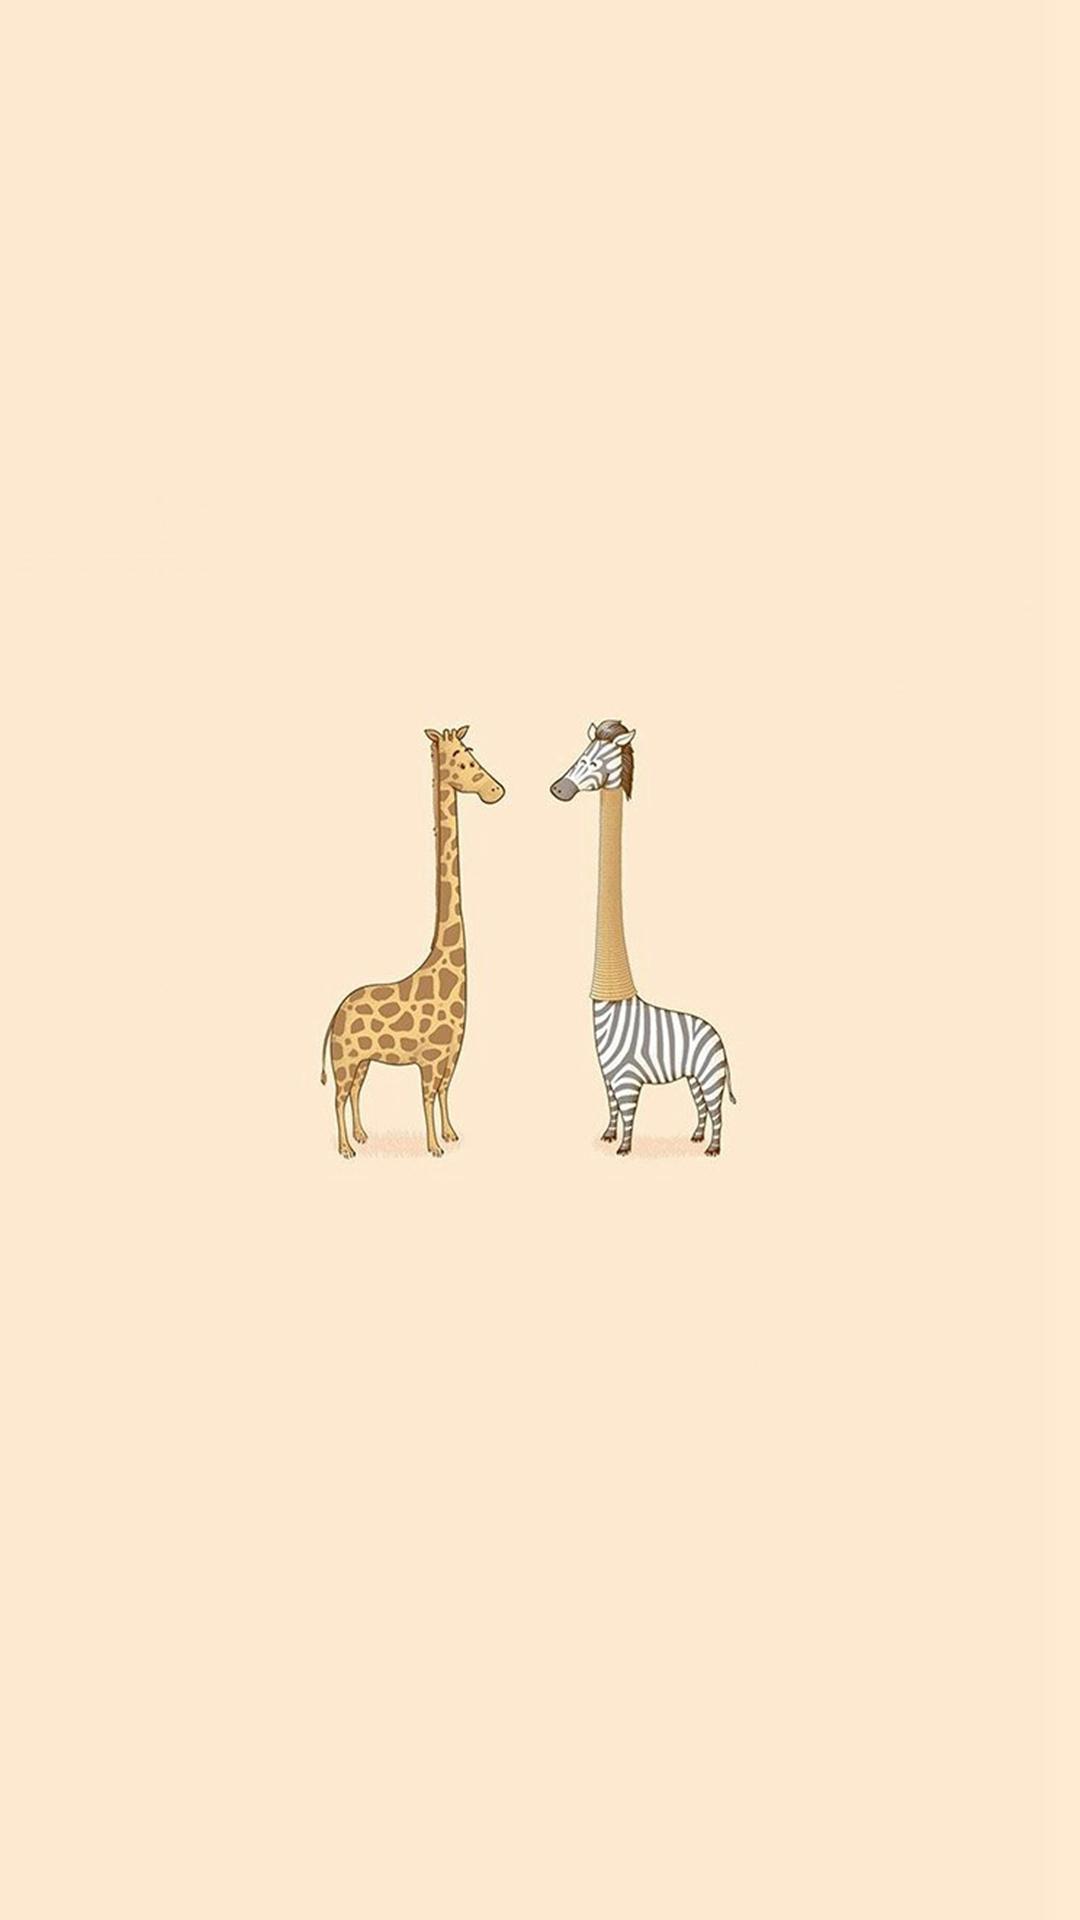 Cute-Giraffe-Yellow-Animal-Minimal-iPhone-wallpaper-wp3604461